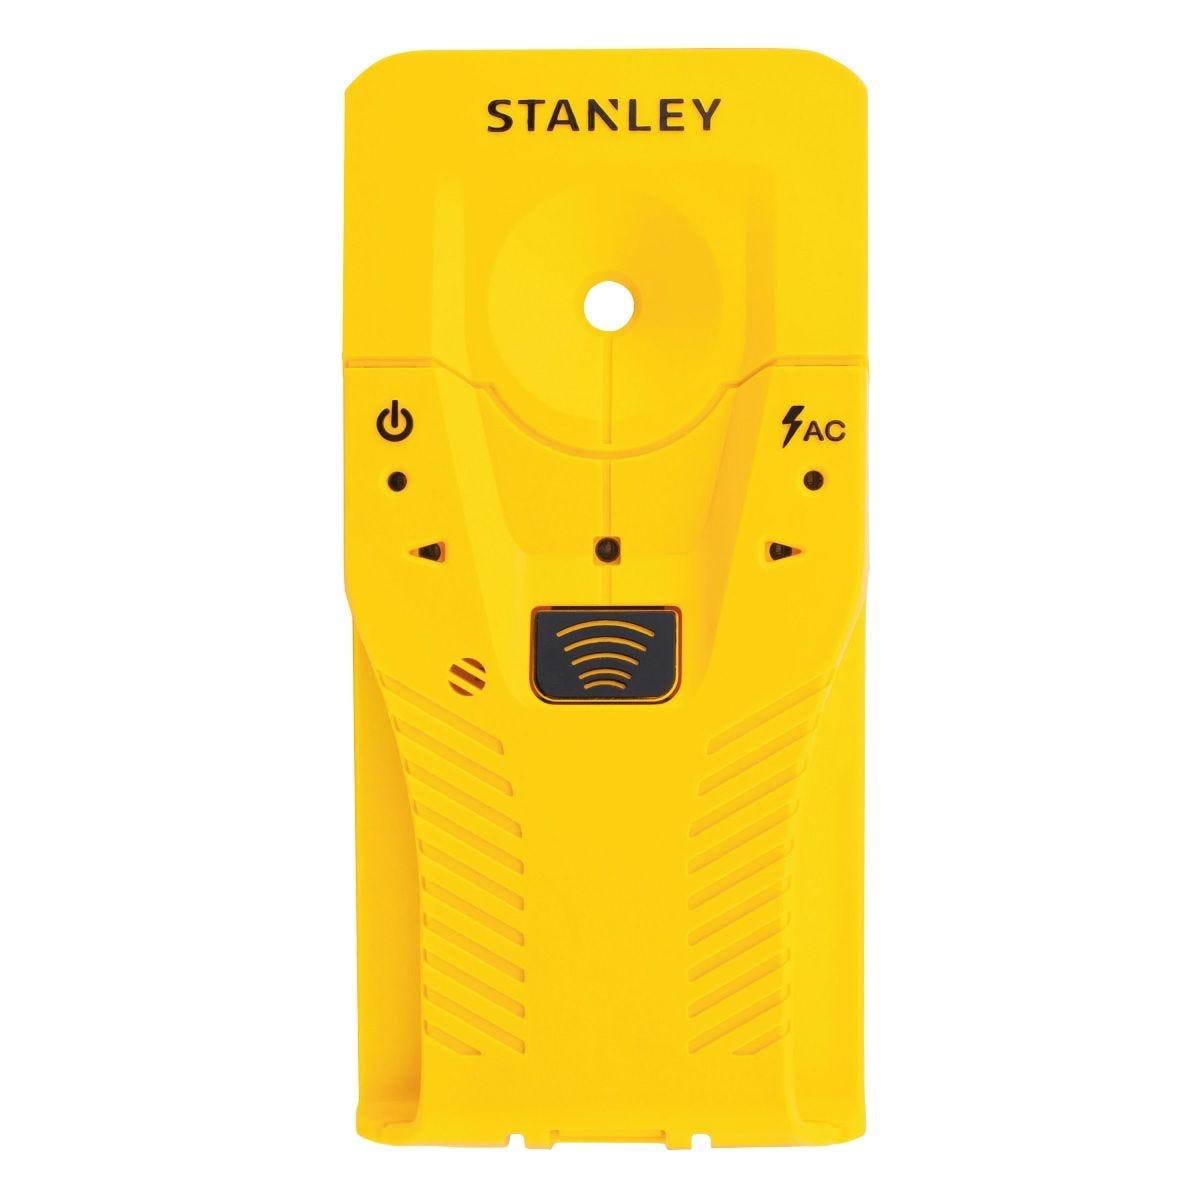 Stanley 3/4 In. S110 Stud Finder/Sensor